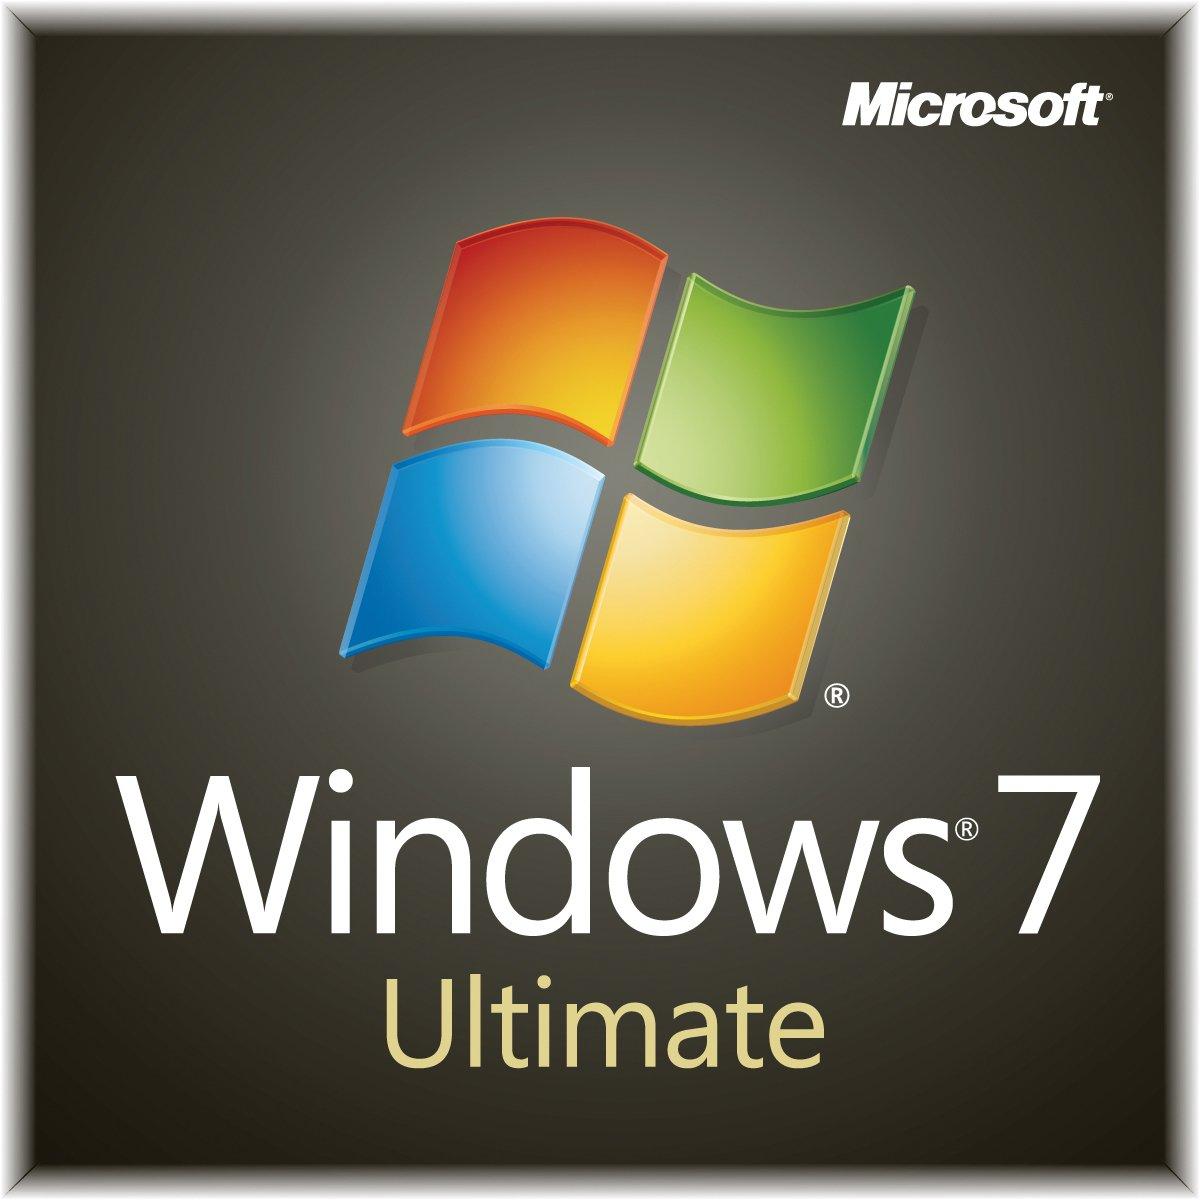 Microsoft Windows7 Ultimate 64bit Service Pack 1 日本語 DSP版 DVD LCP 【紙パッケージ版】 B00HVT9SNI Parent